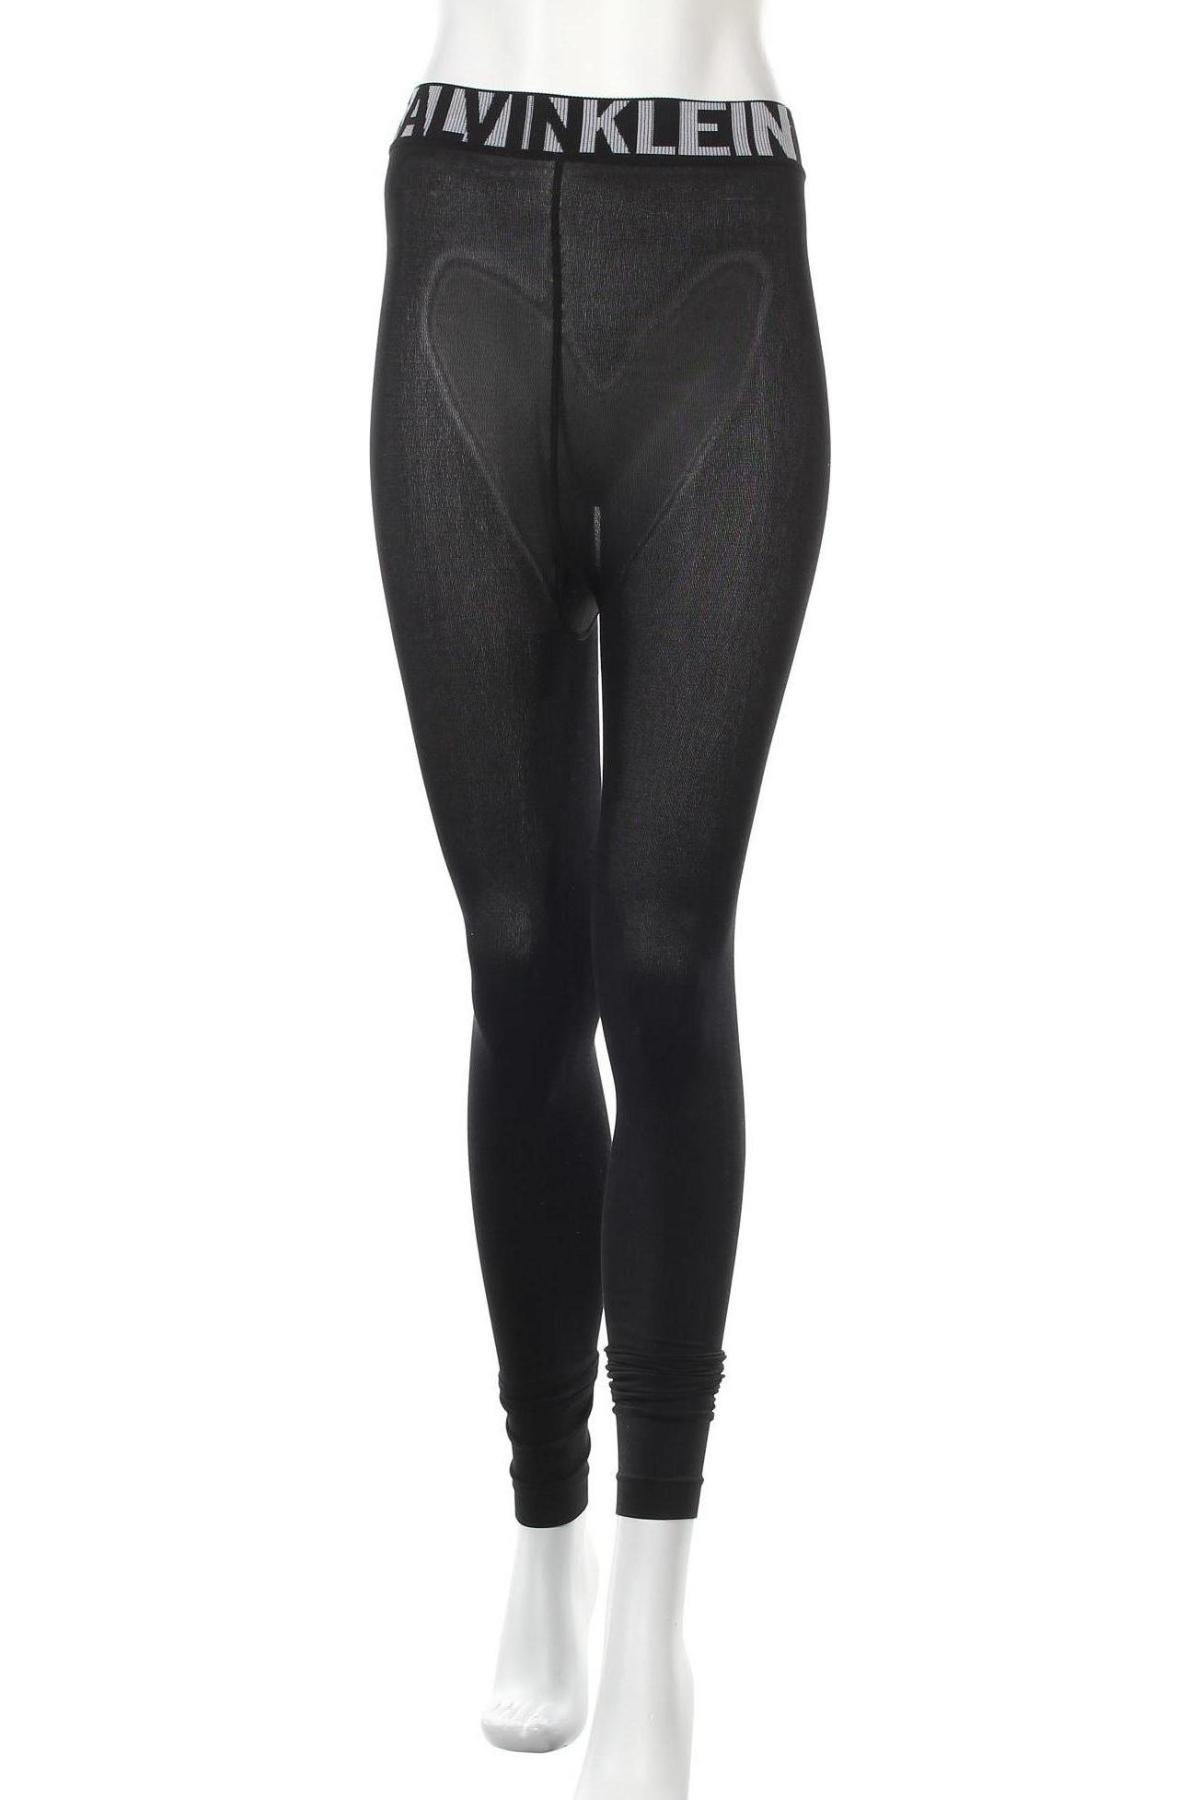 Дамски клин Calvin Klein, Размер S, Цвят Черен, 64% полиестер, 30% полиамид, 6% еластан, Цена 47,40лв.